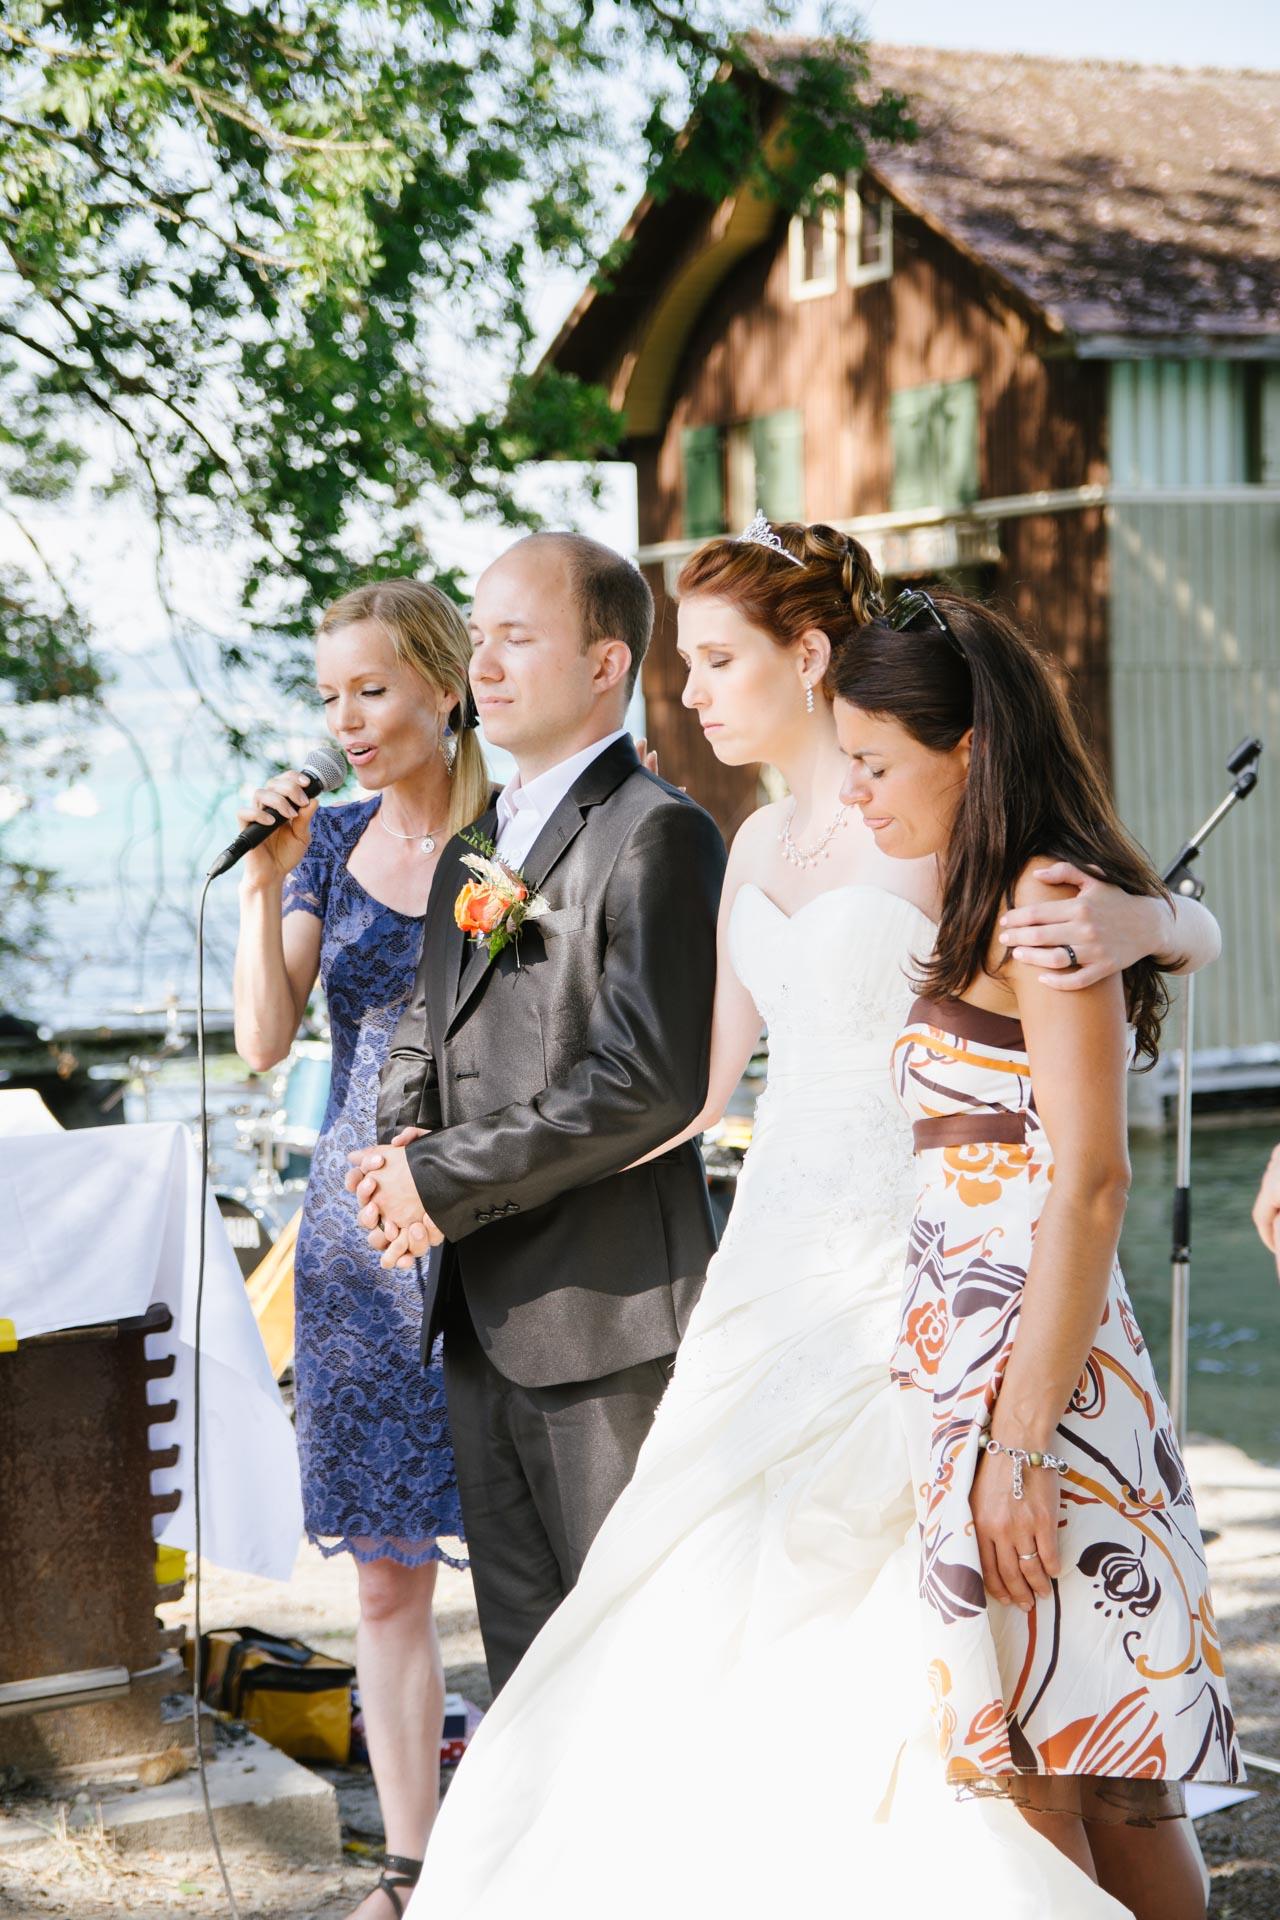 Pixelart_Hochzeitsfotografen_Loerrach_Rheinfelden_Hallwil_Schweiz_Linda-Ramon-1039